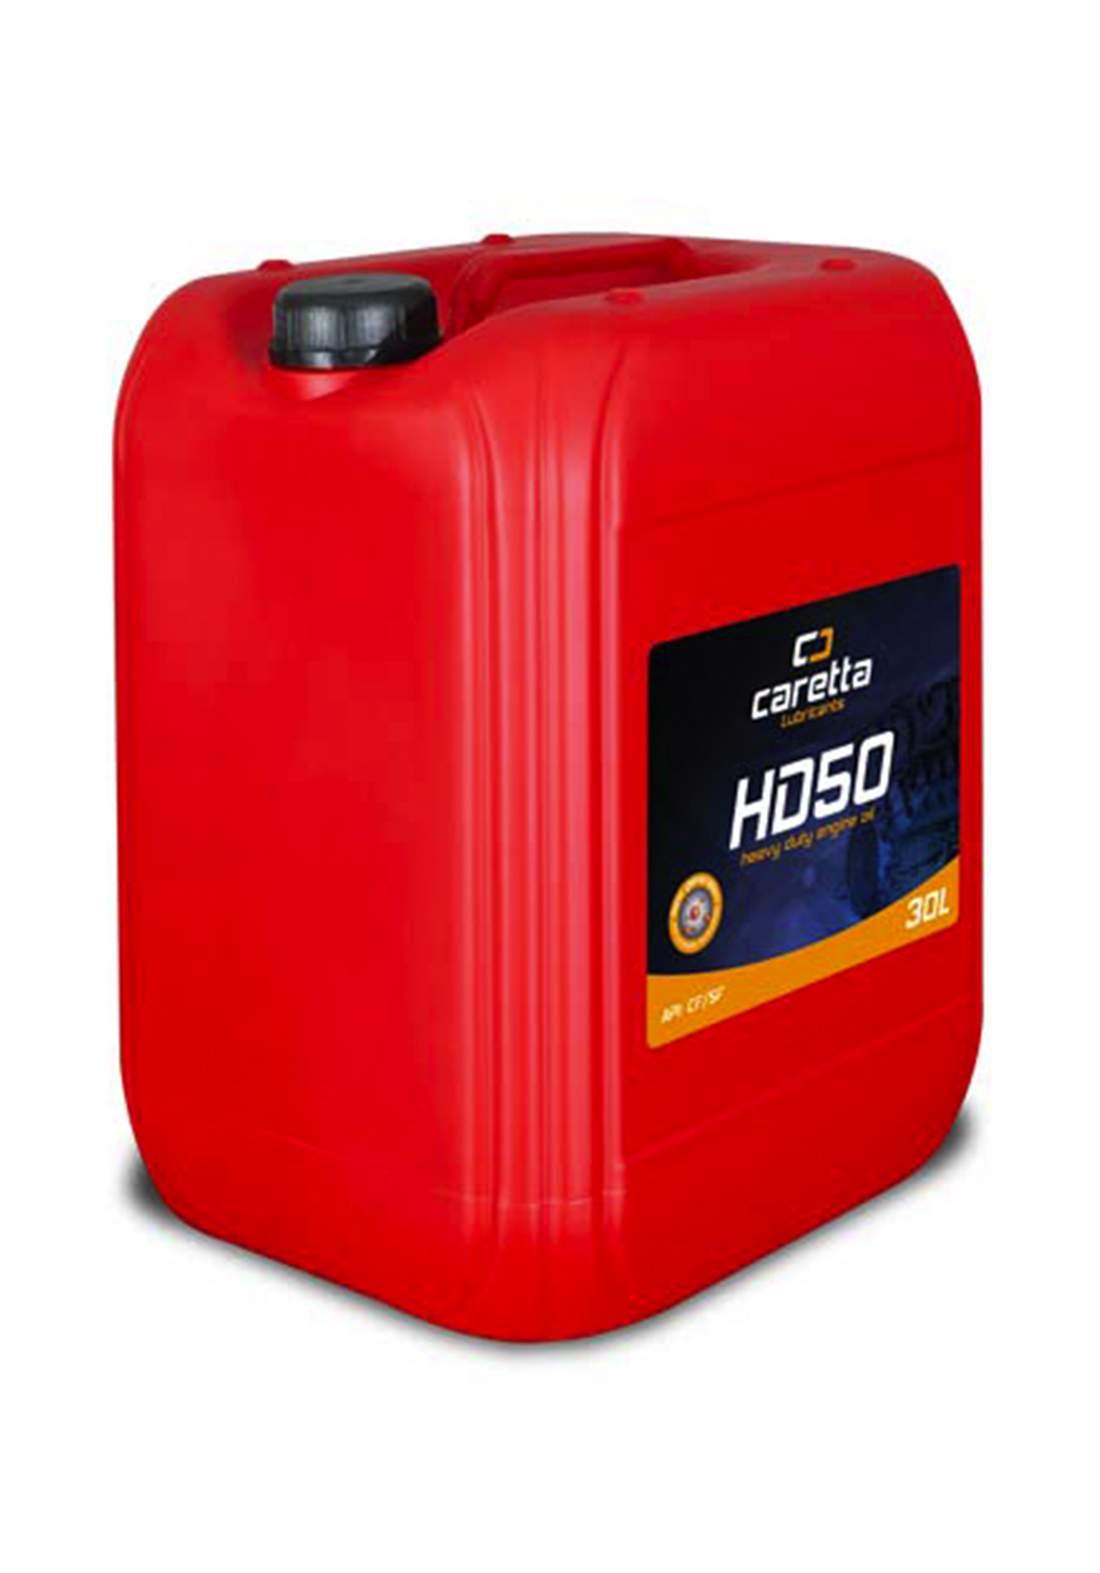 Caretta HD50 Engine Oil 30L زيت محرك